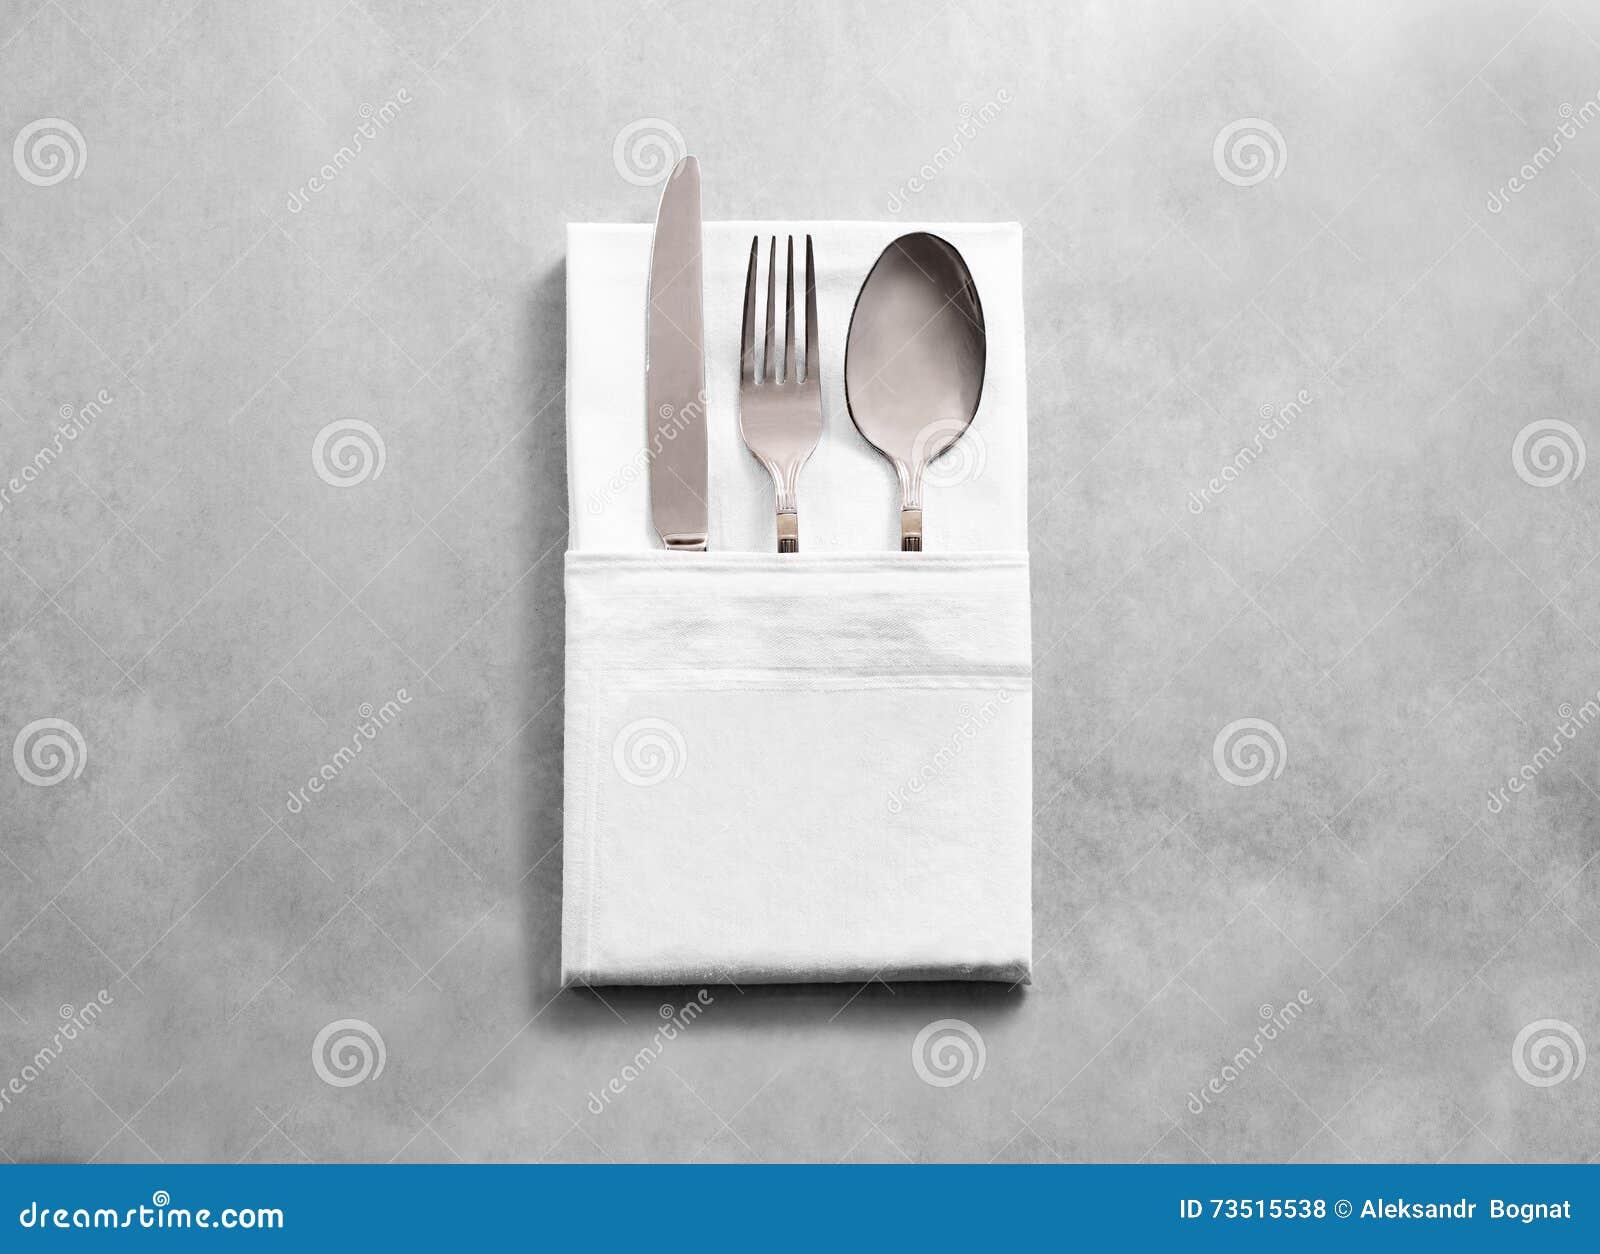 Blank White Restaurant Cloth Napkin Mockup With Silver